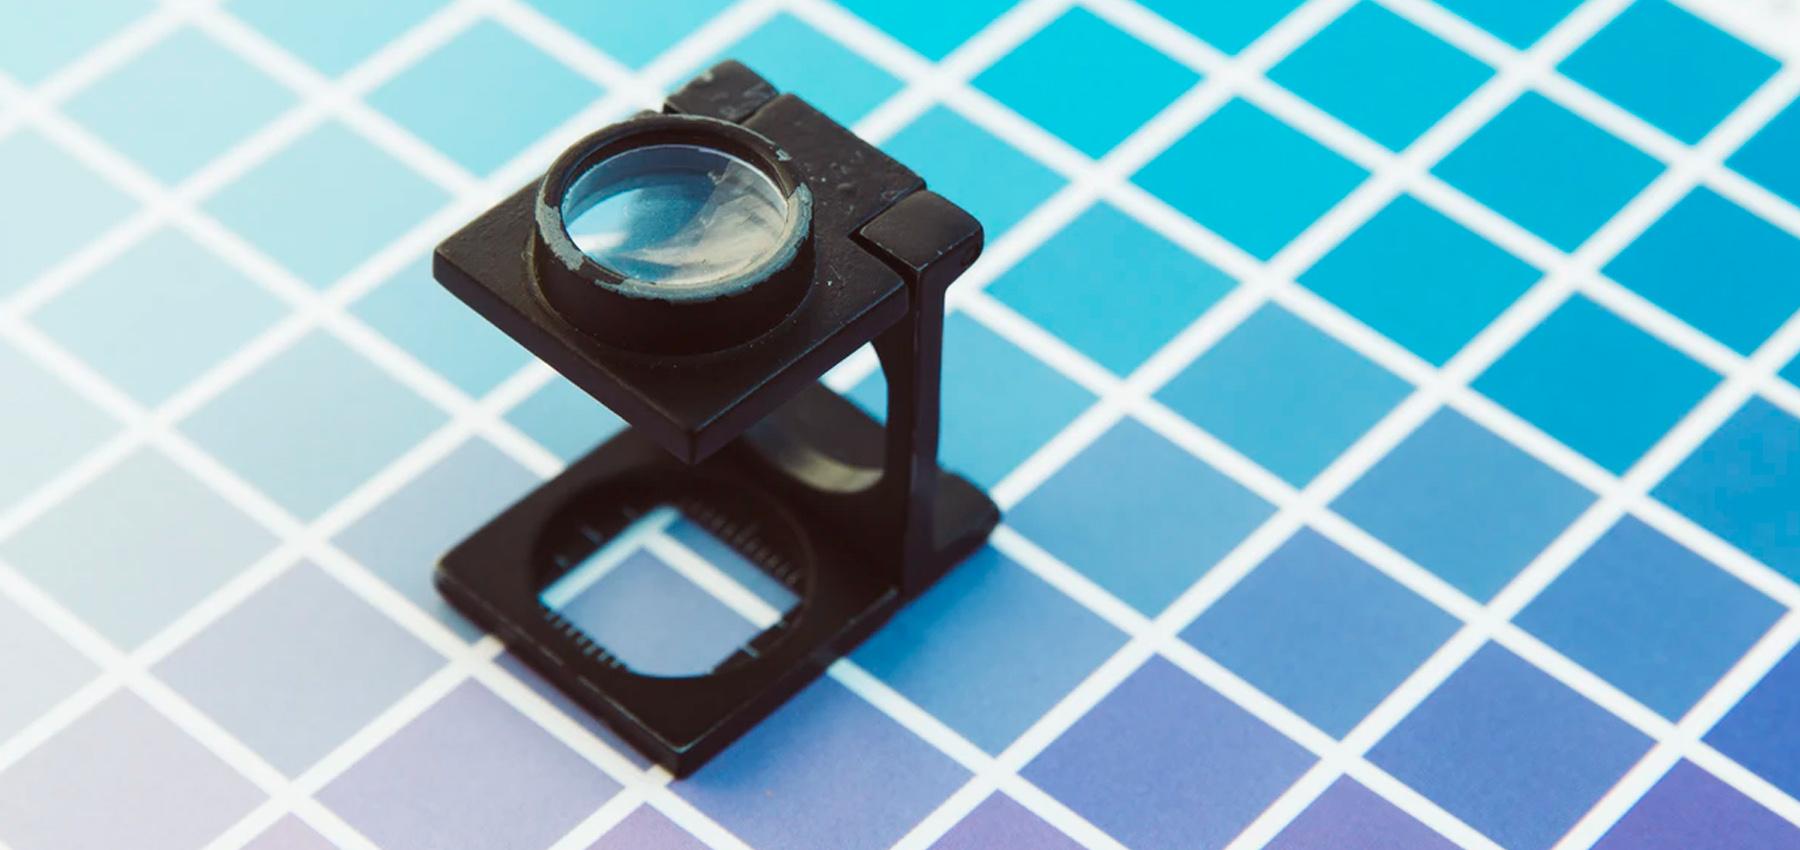 Diferencias entre sistemas de impresión